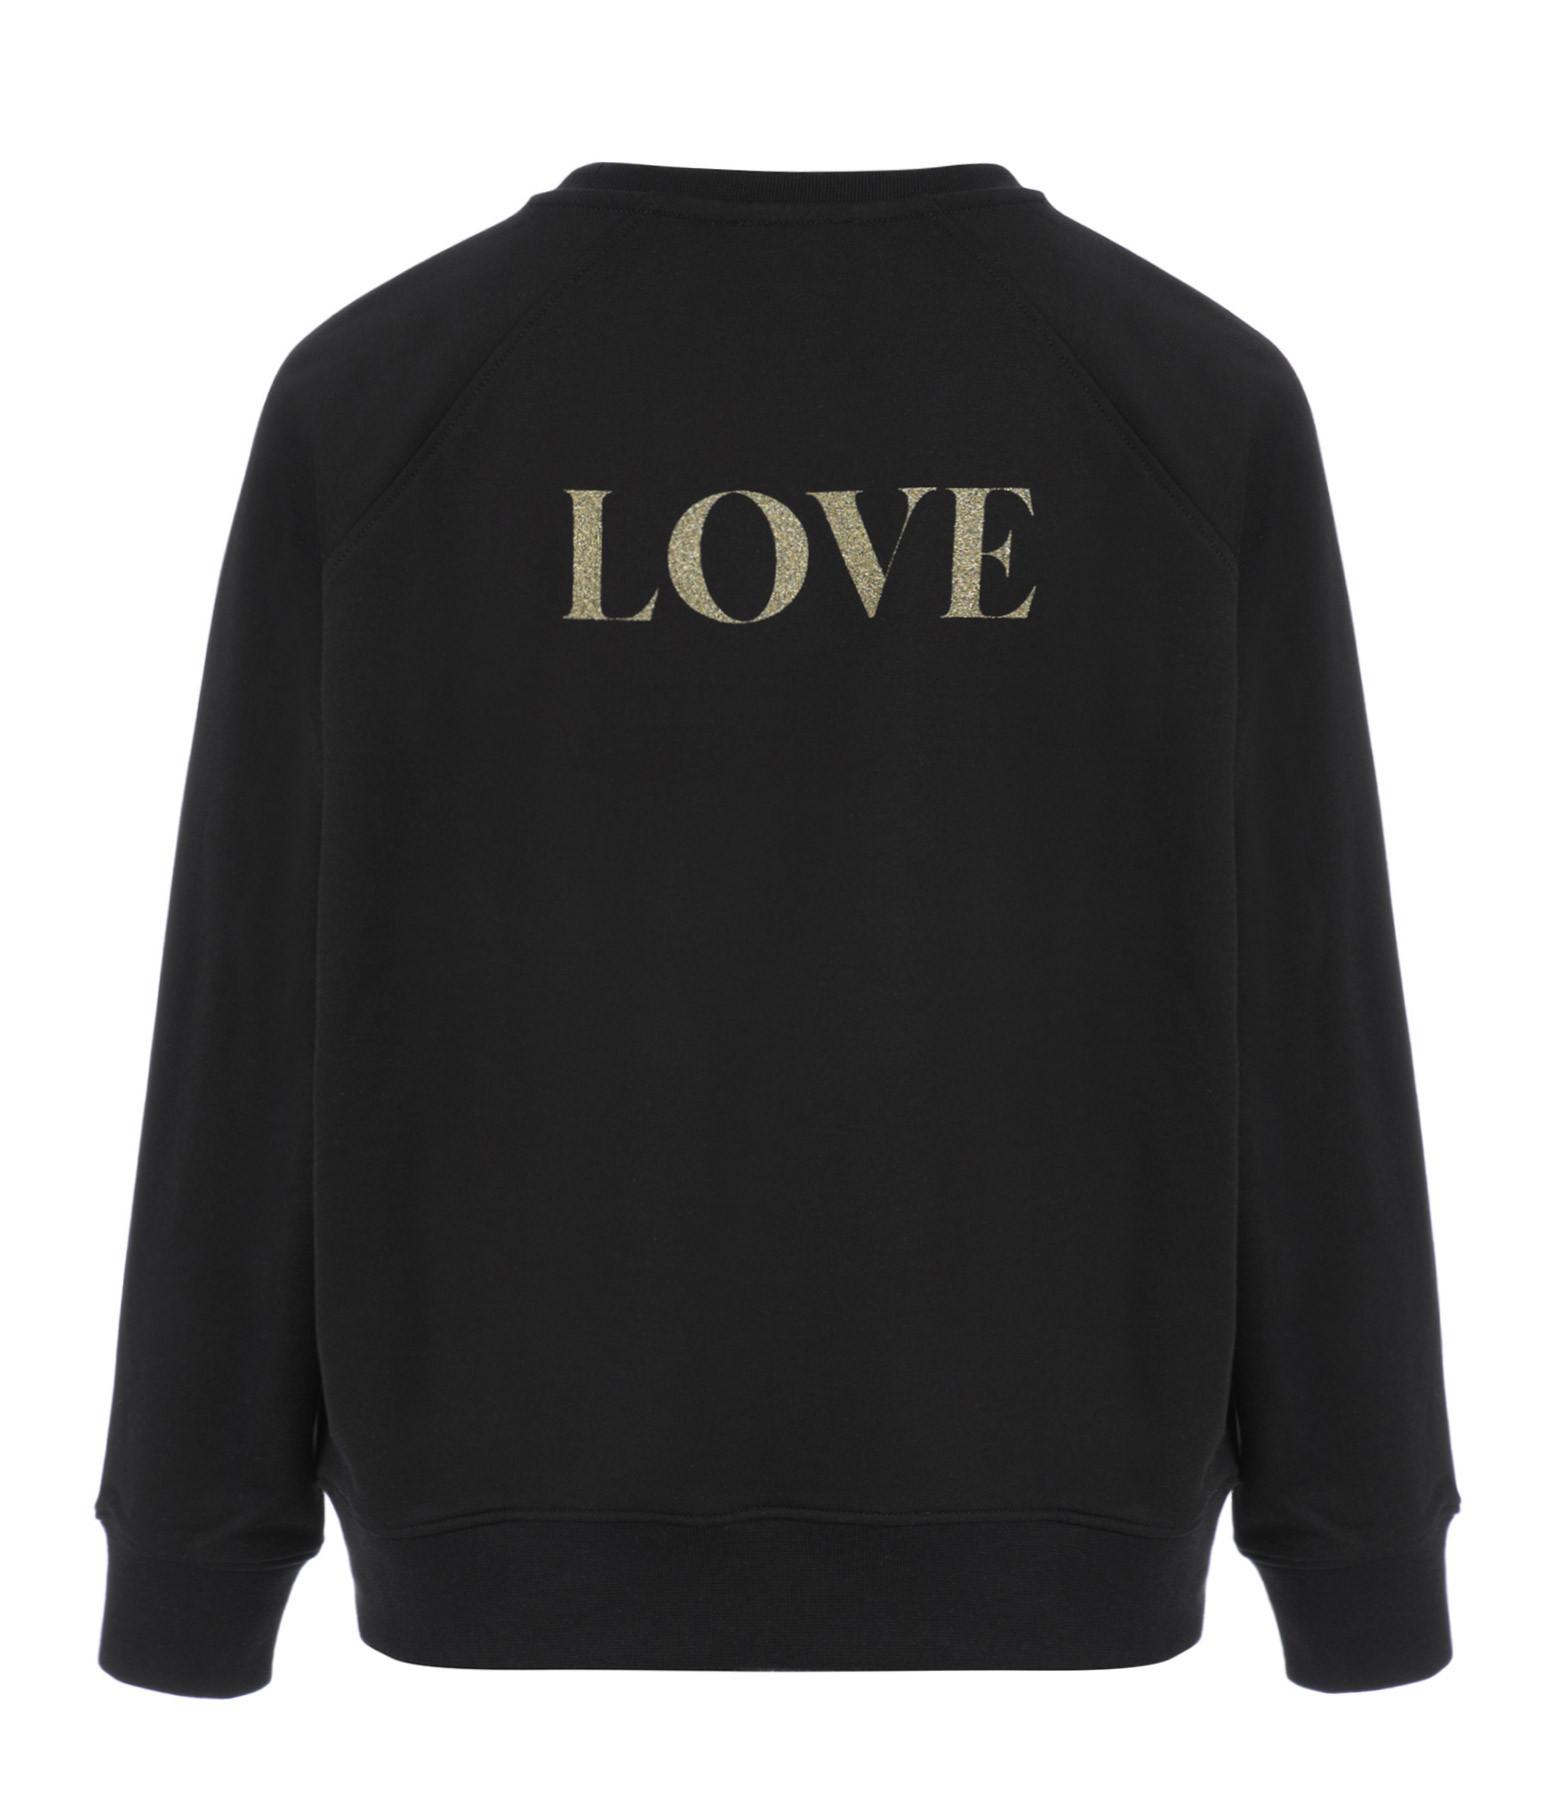 JEANNE VOULAND - Sweatshirt Celo Rock Love Glitter, Exclusivité Noël